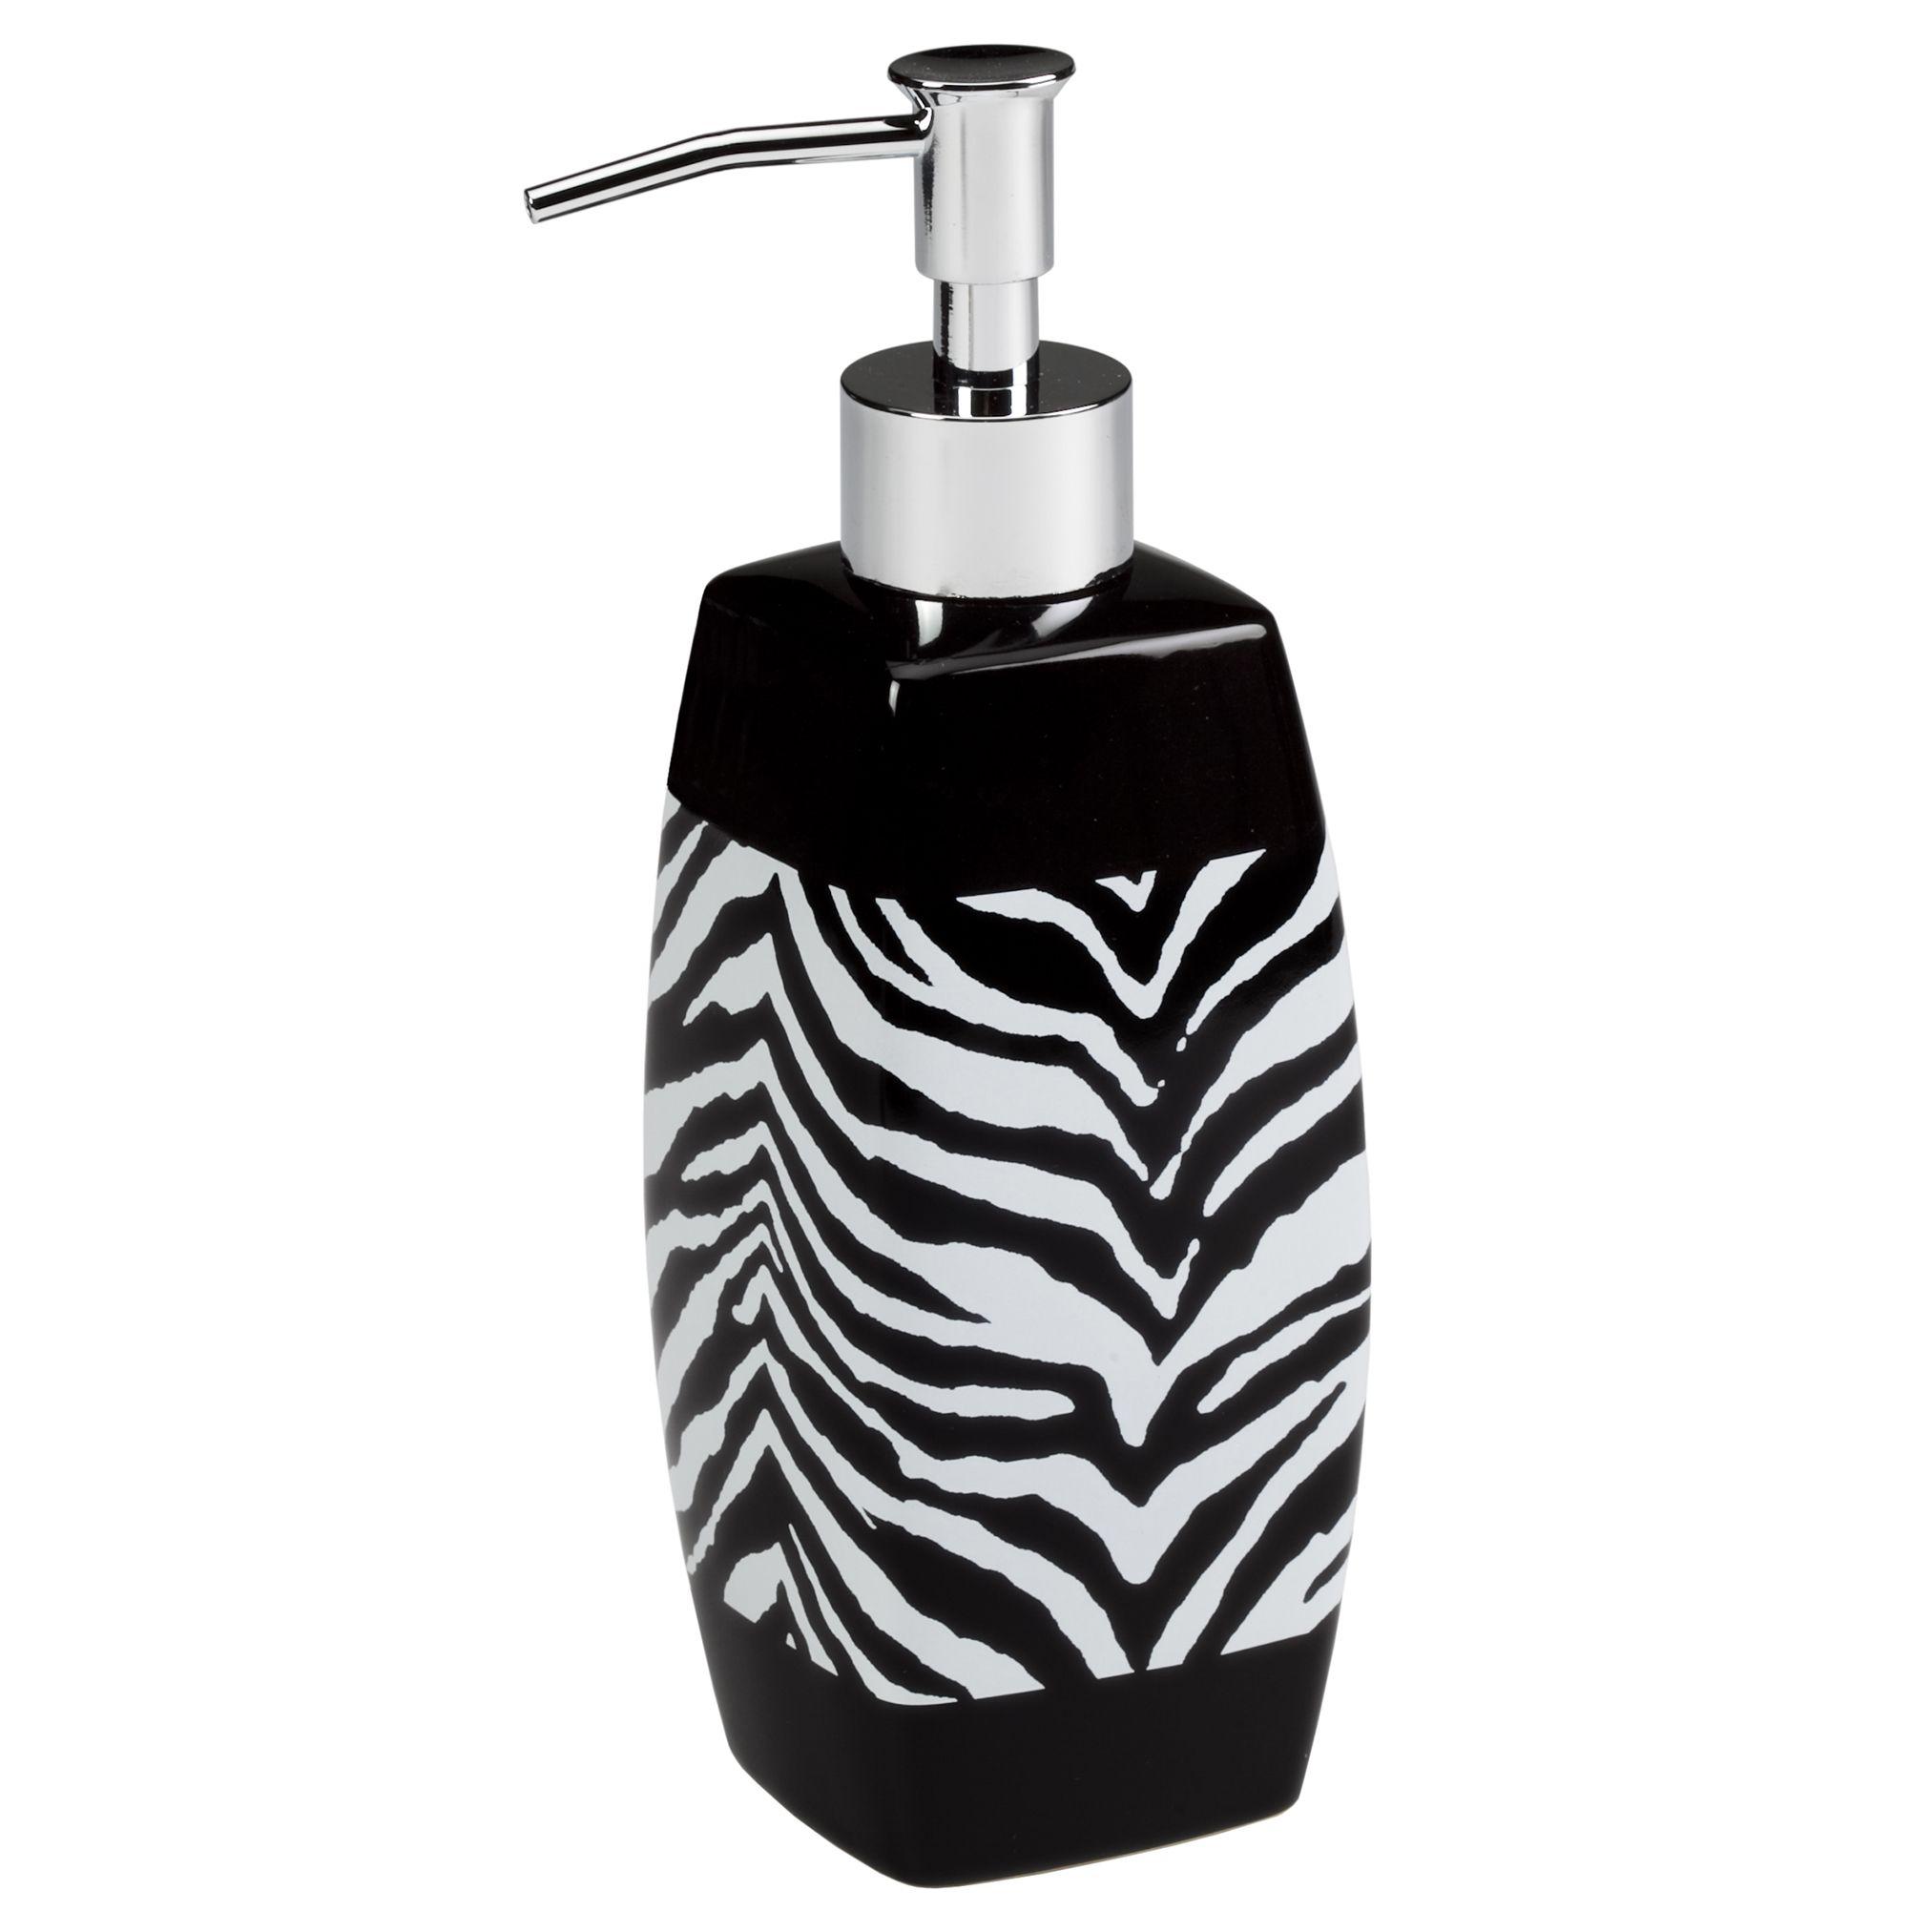 Creative Bath Zebra Lotion Dispenser, Multi | Products | Pinterest ...